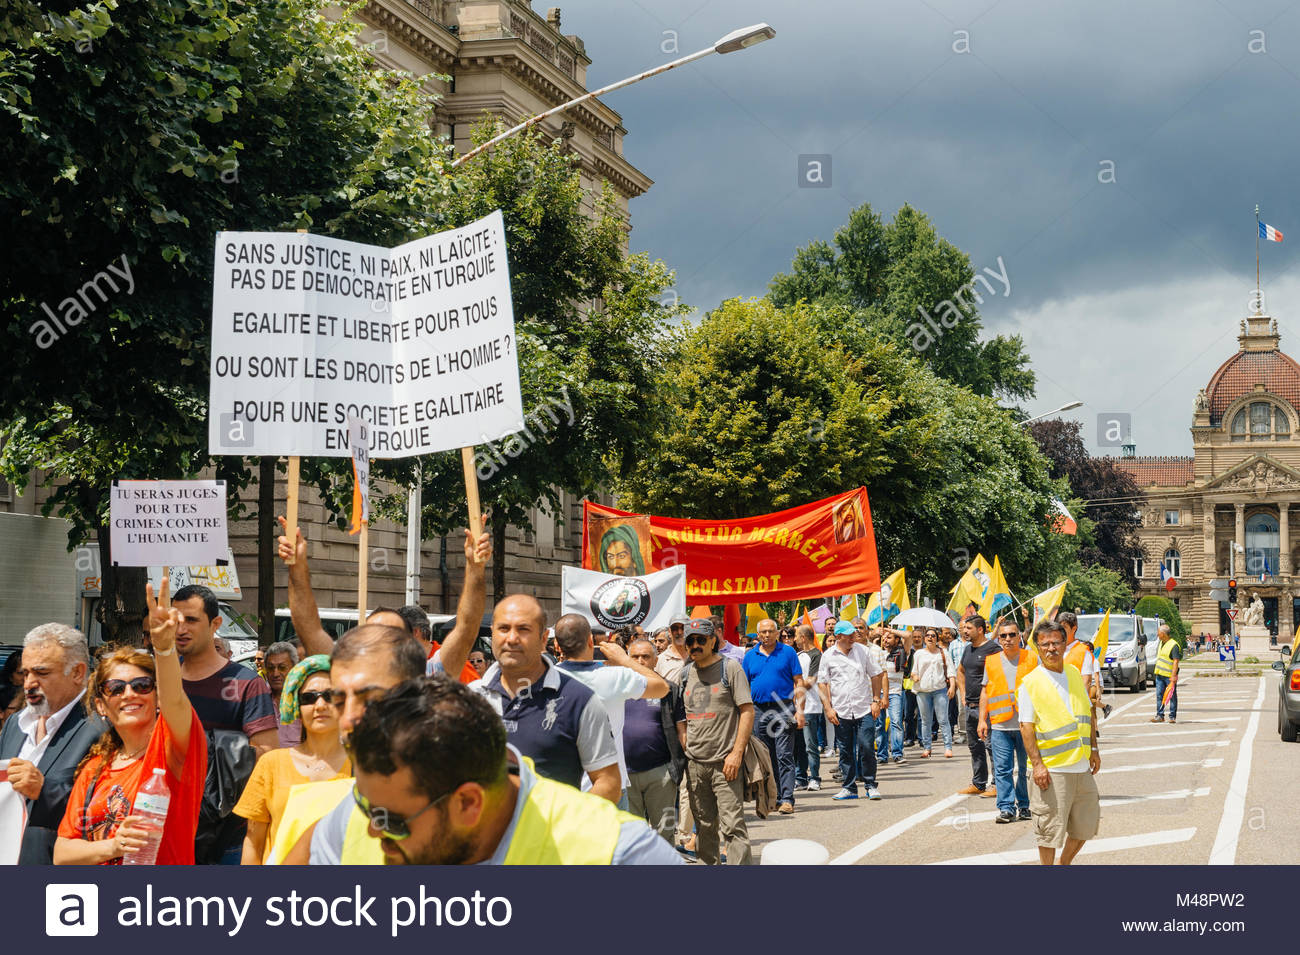 Members of Turkey's Alevi community protesting - Stock Image